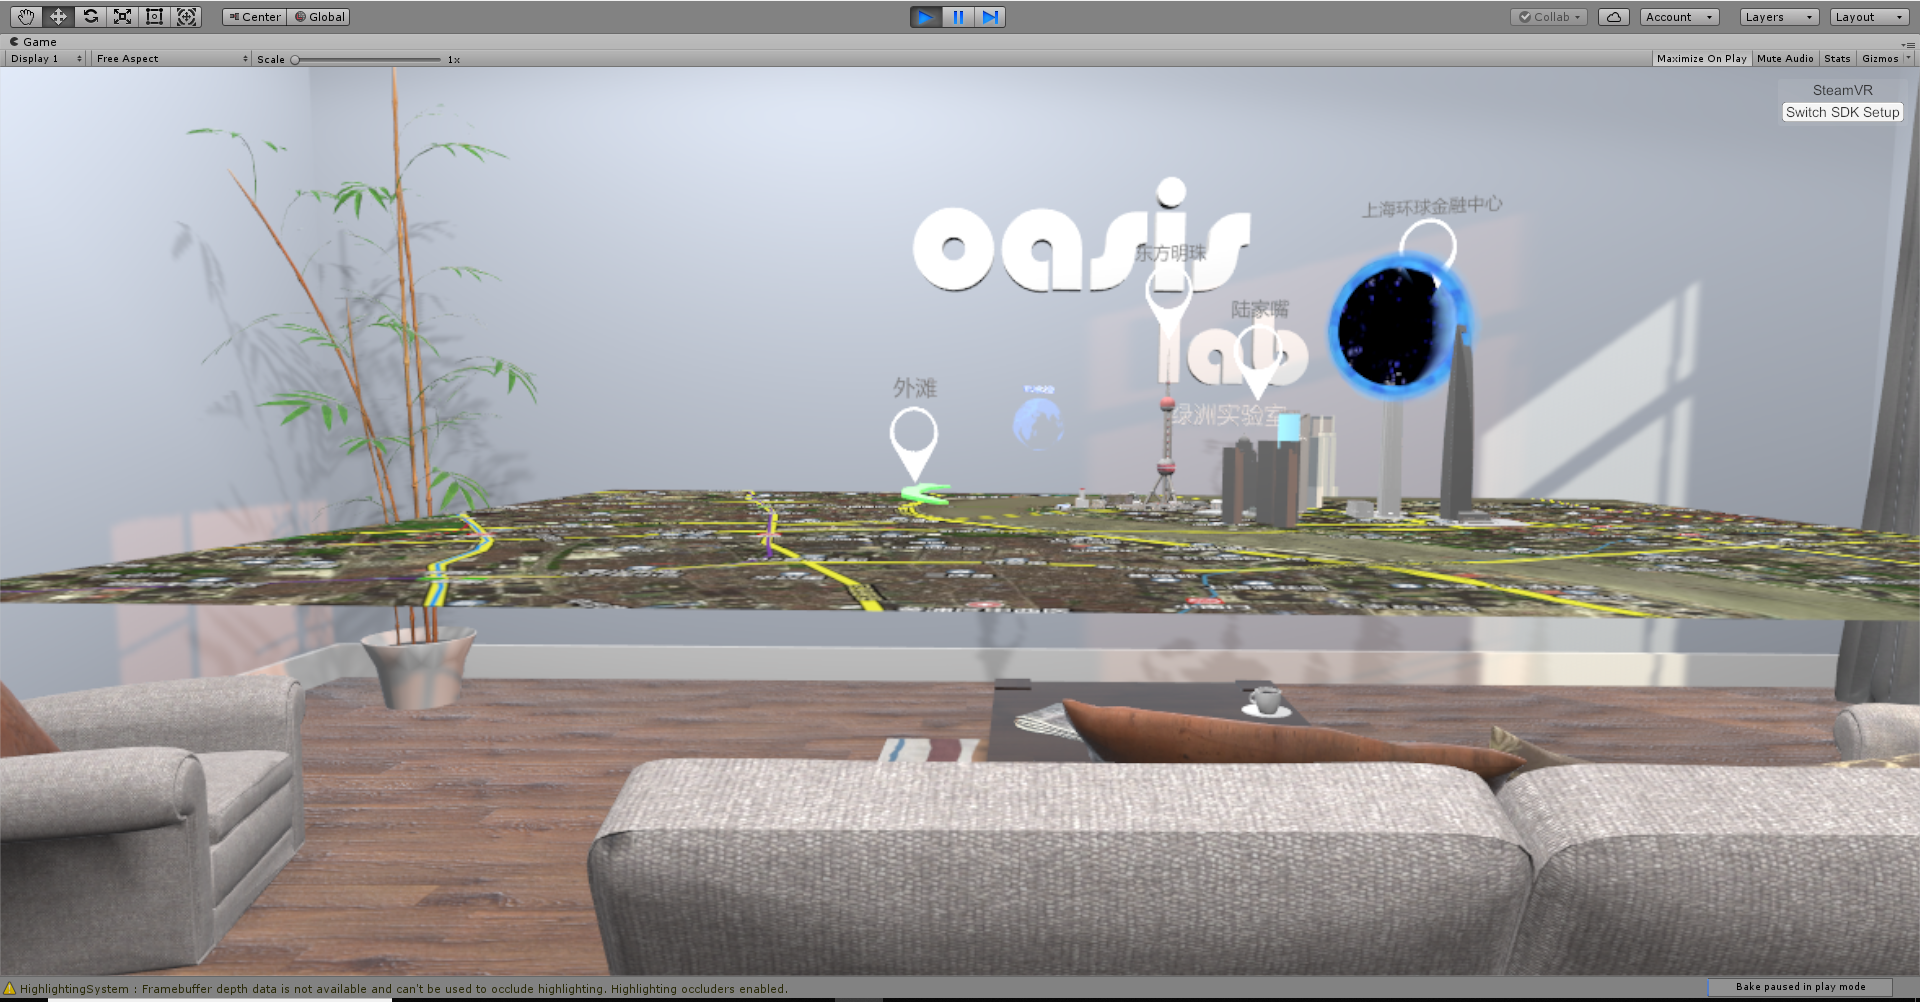 VR文旅平台 Oasis Lab新媒体团队